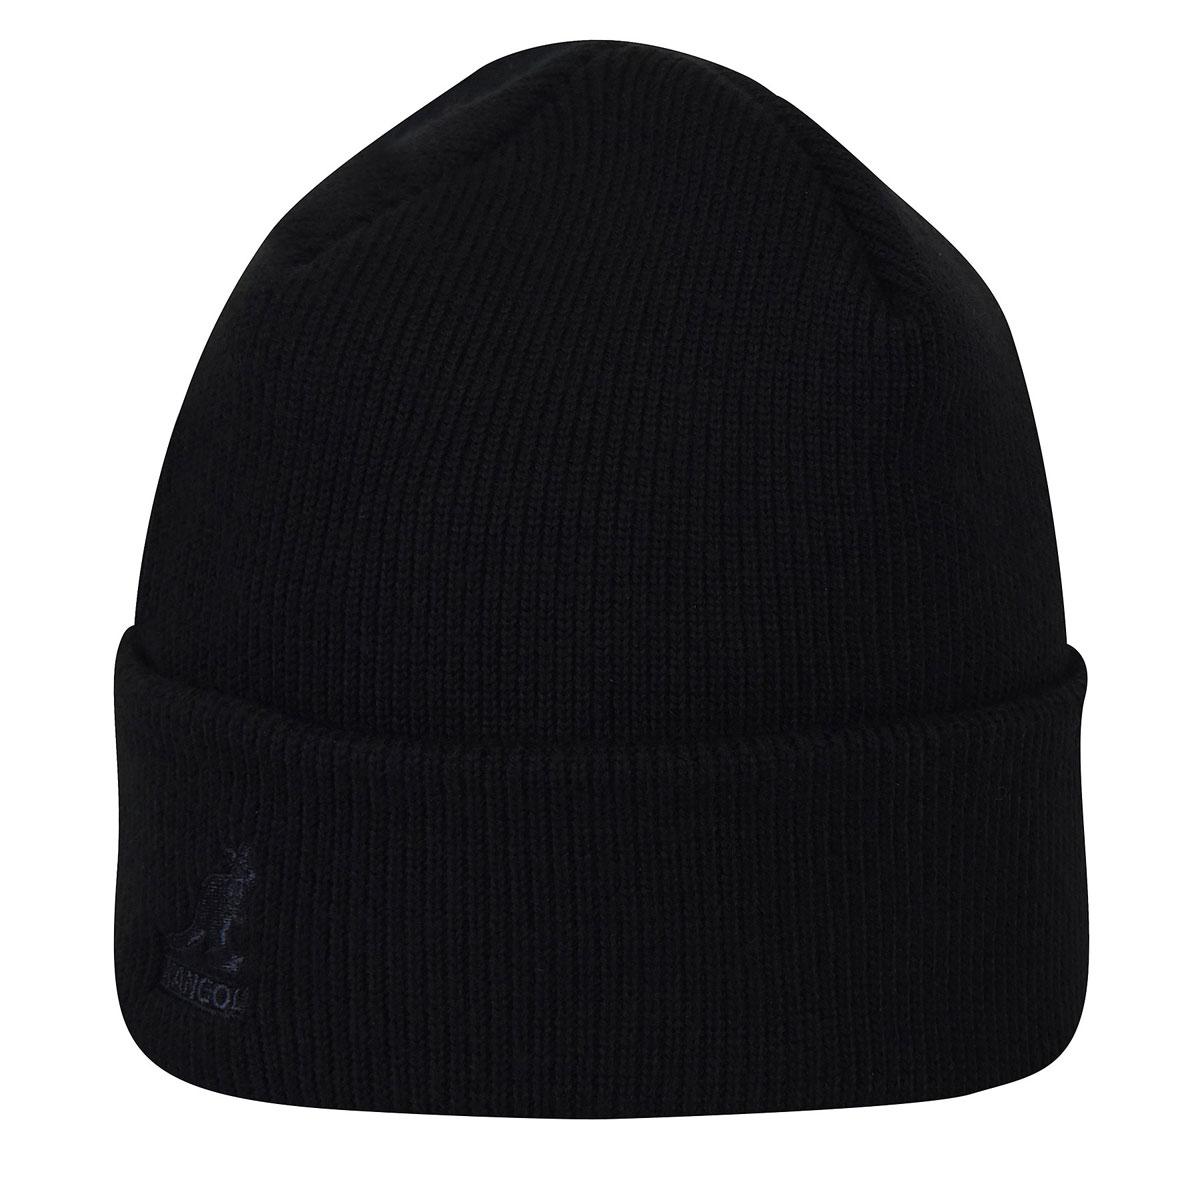 Kangol Acrylic Cuff Pull-On in Black,Black